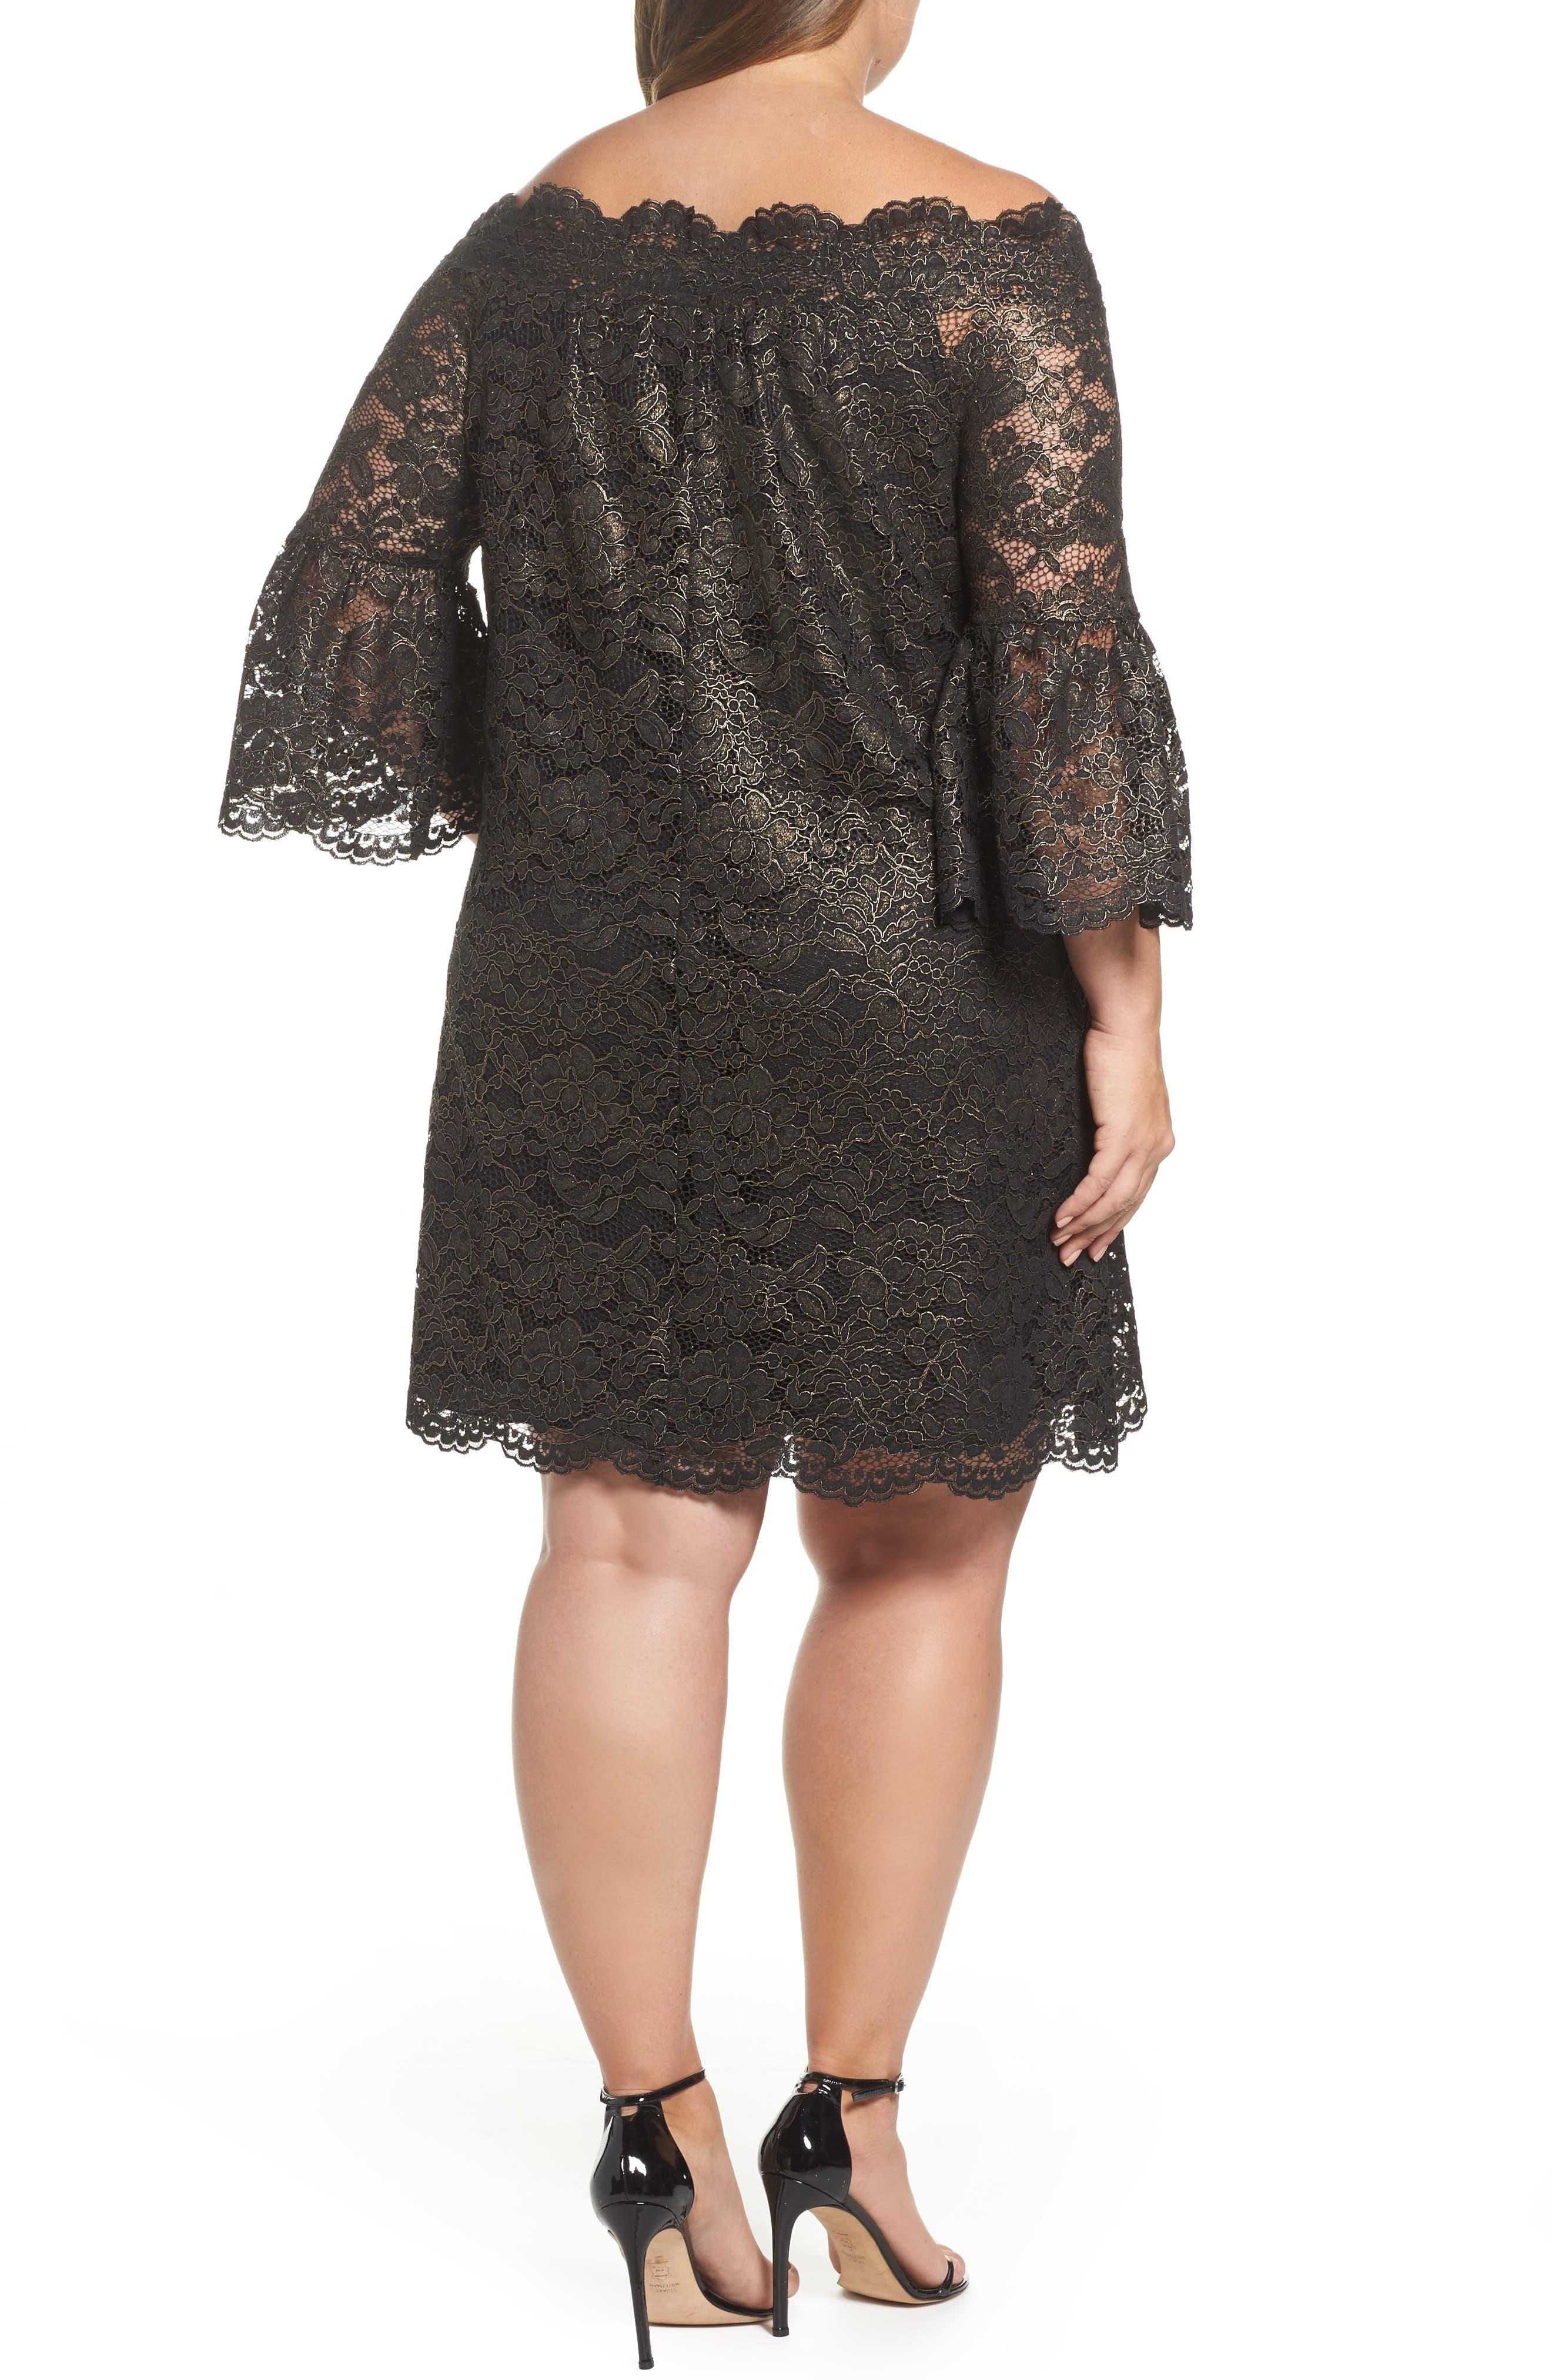 Off the Shoulder Black Gold Lace Dress,                             Alternate thumbnail 2, color,                             005